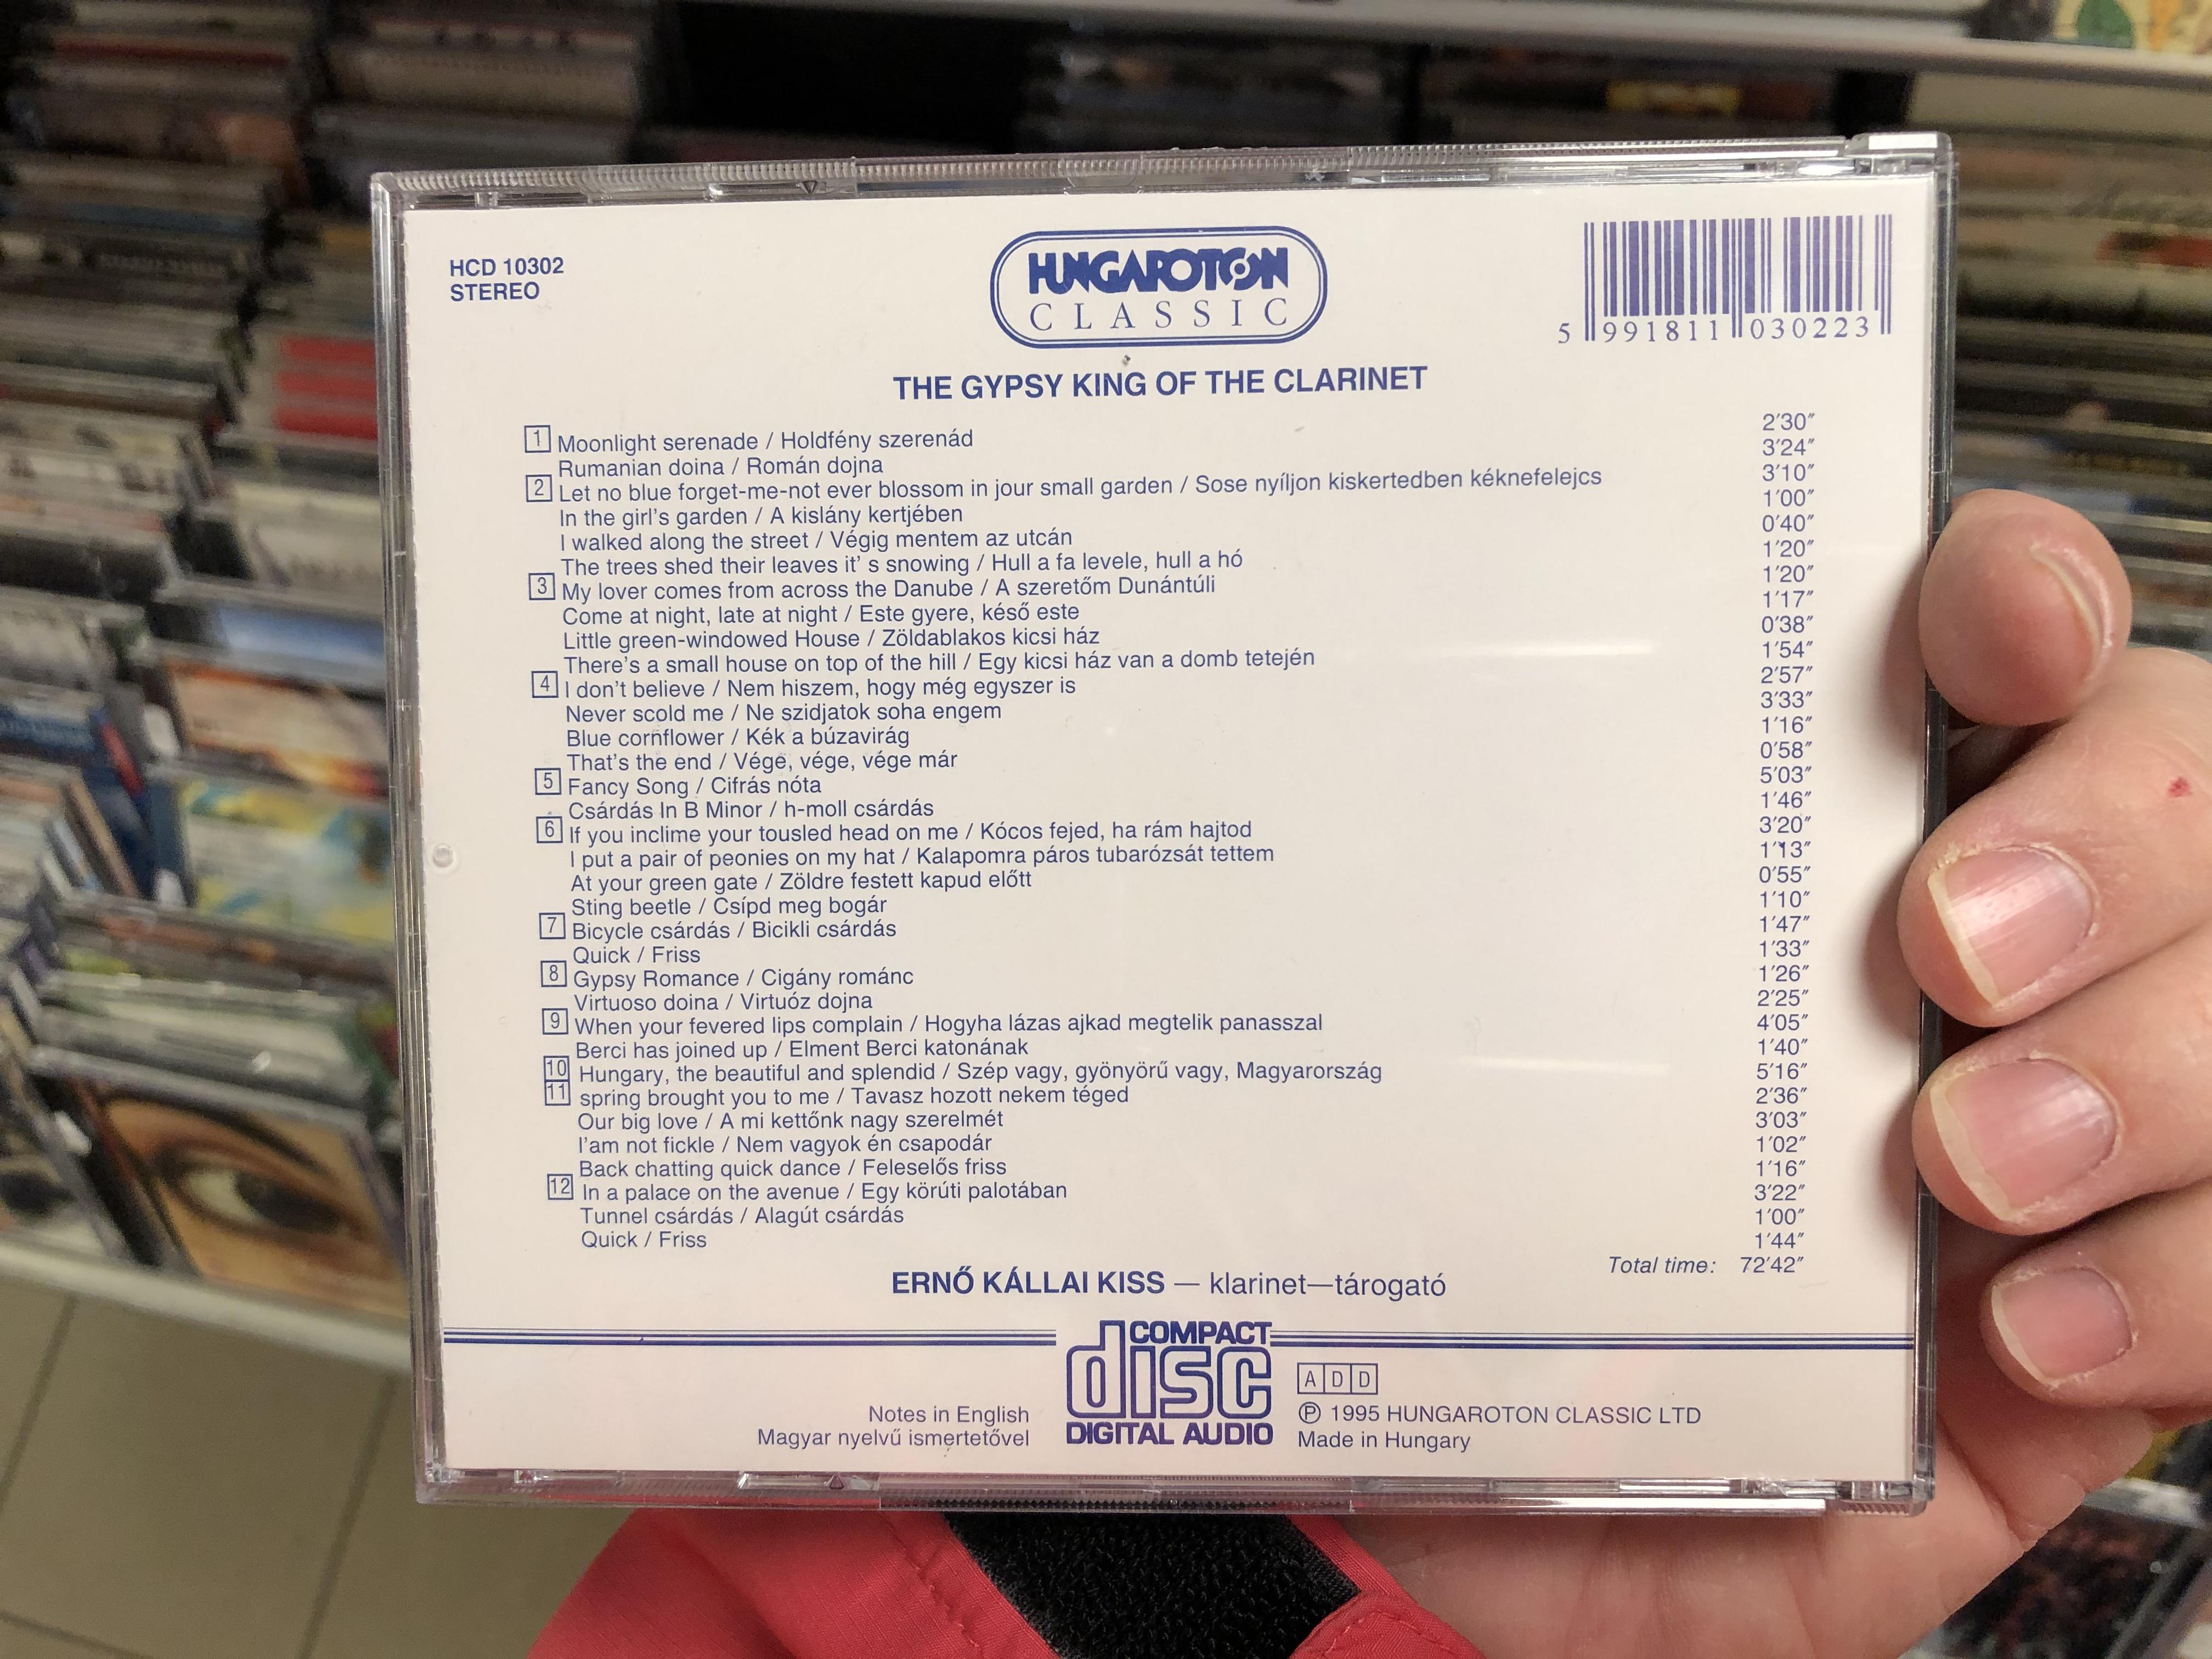 the-gypsy-king-of-the-clarinet-ern-k-llai-kiss-hungaroton-classic-audio-cd-1995-stereo-hcd-10302-2-.jpg